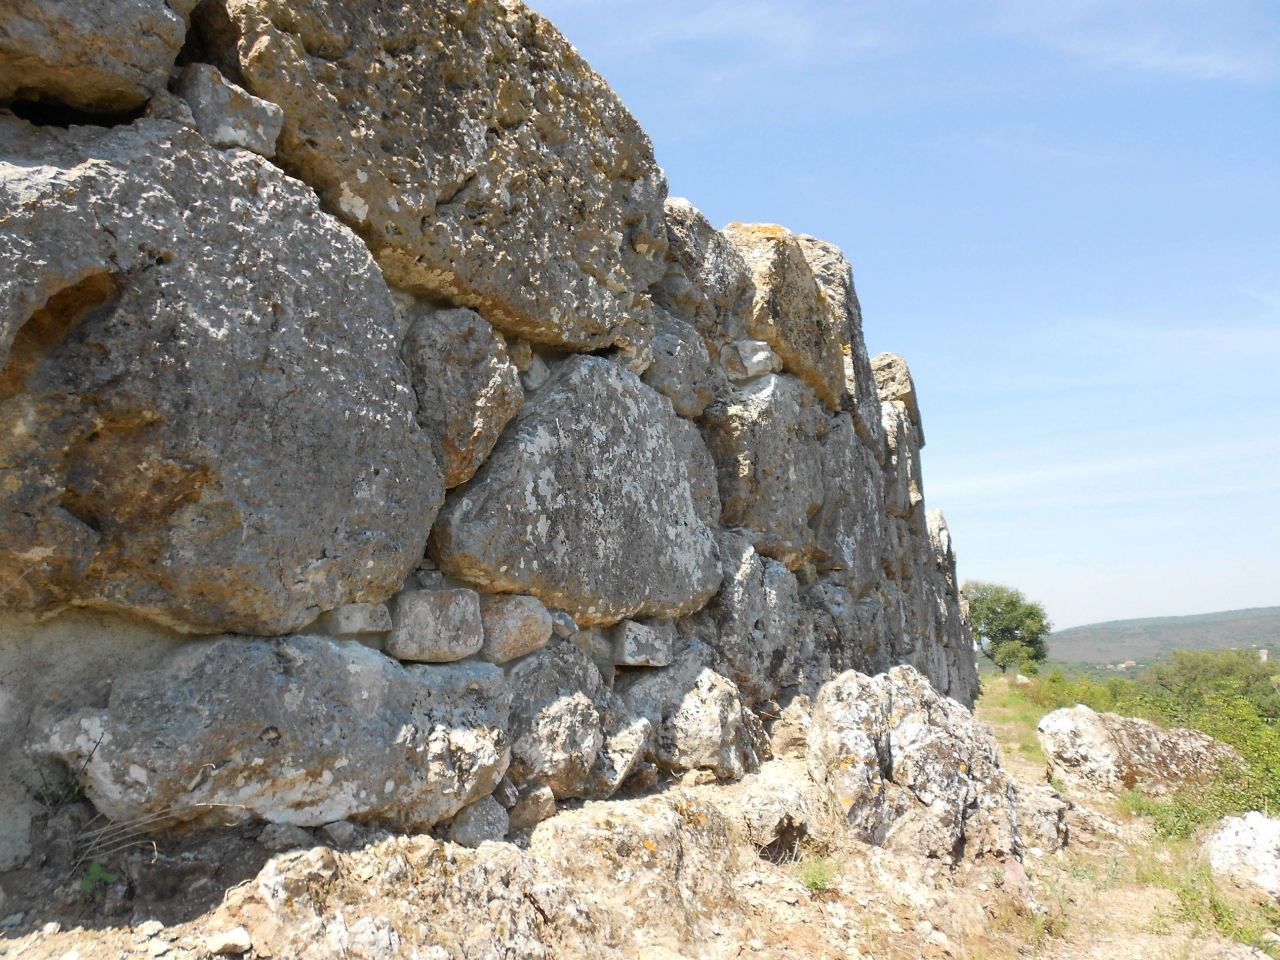 Roselle-Mura-Megalitiche-Roselle-Grosseto-Toscana-Italia-32